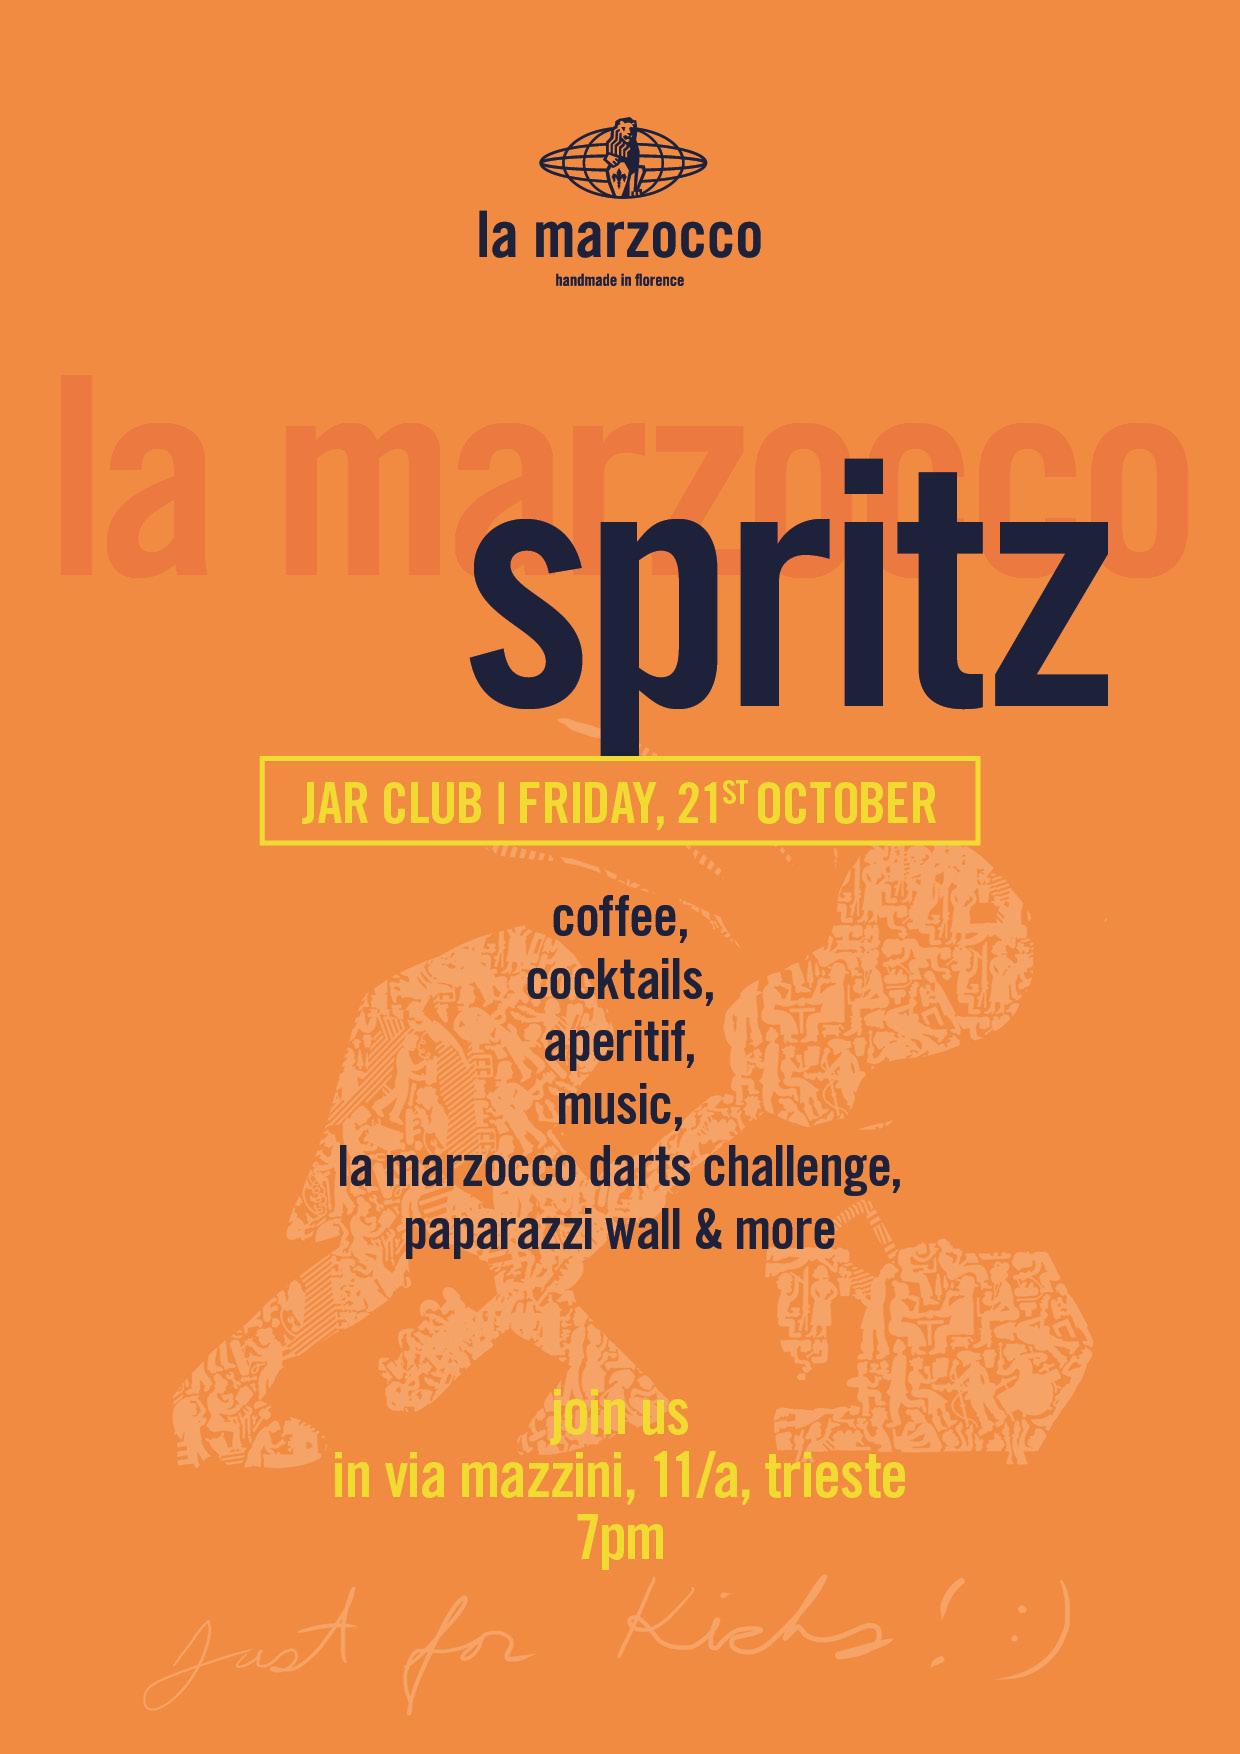 la-marzocco-spritz-jar-clubtrieste-2016